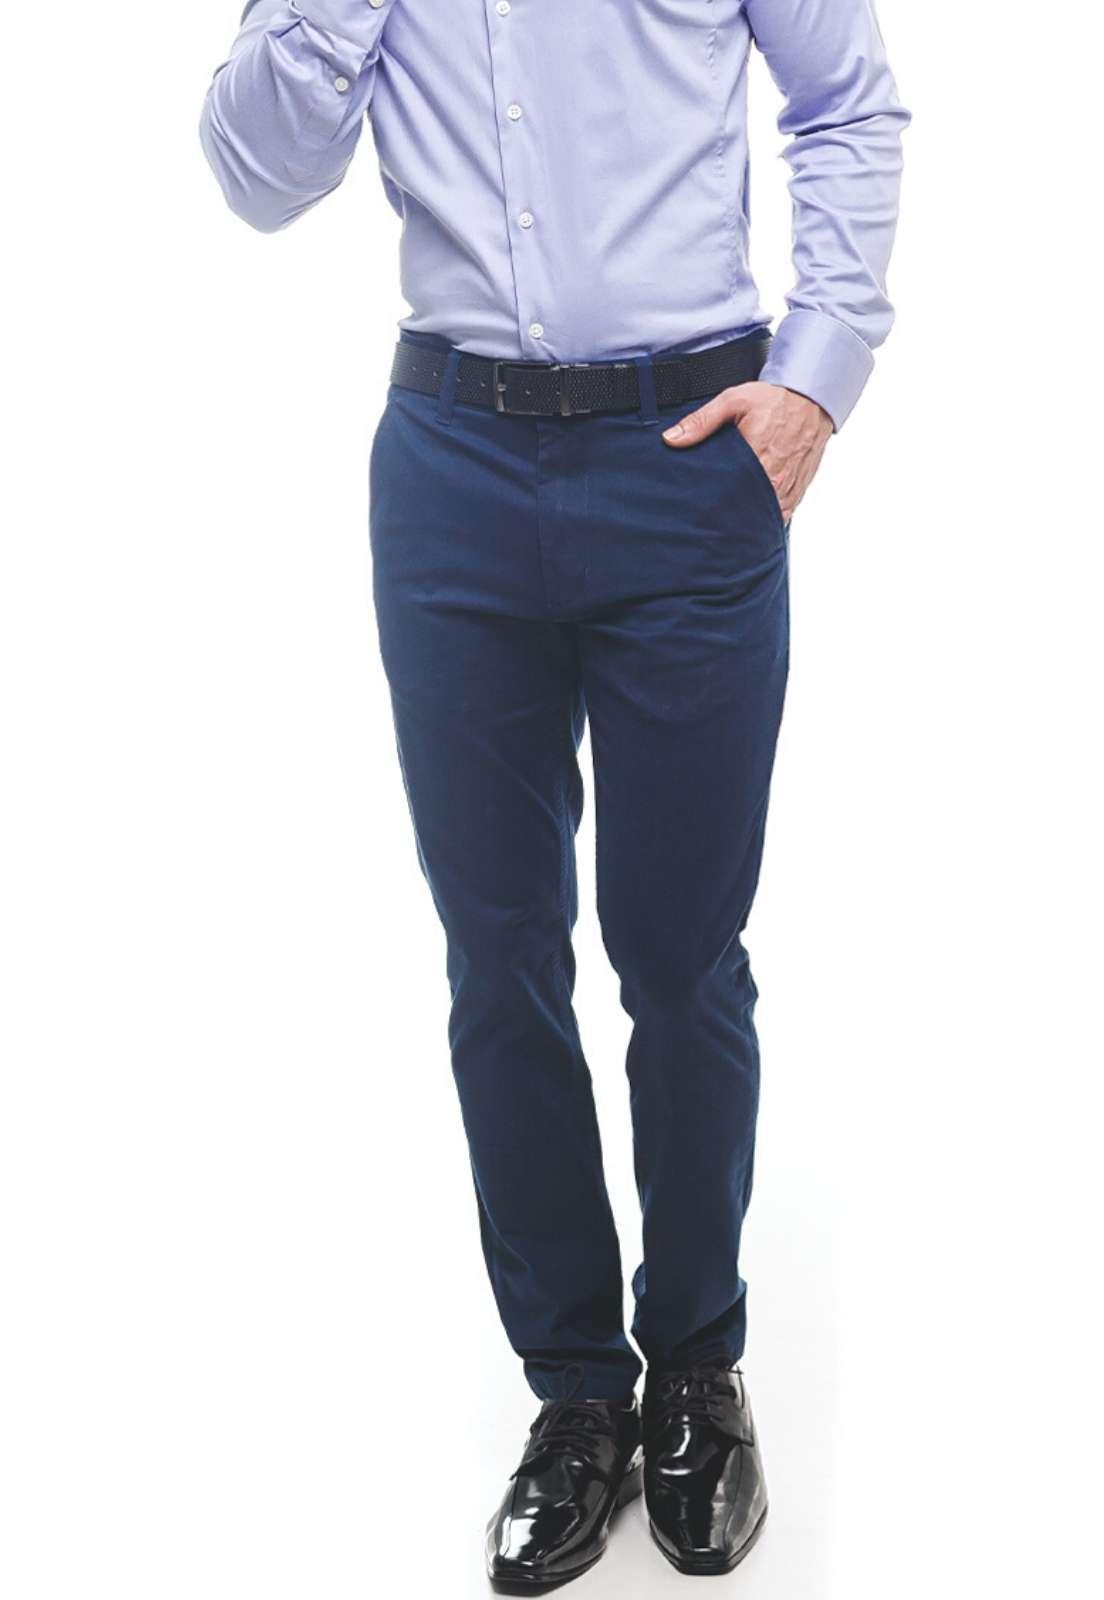 Calça Azul Marinho Masculina